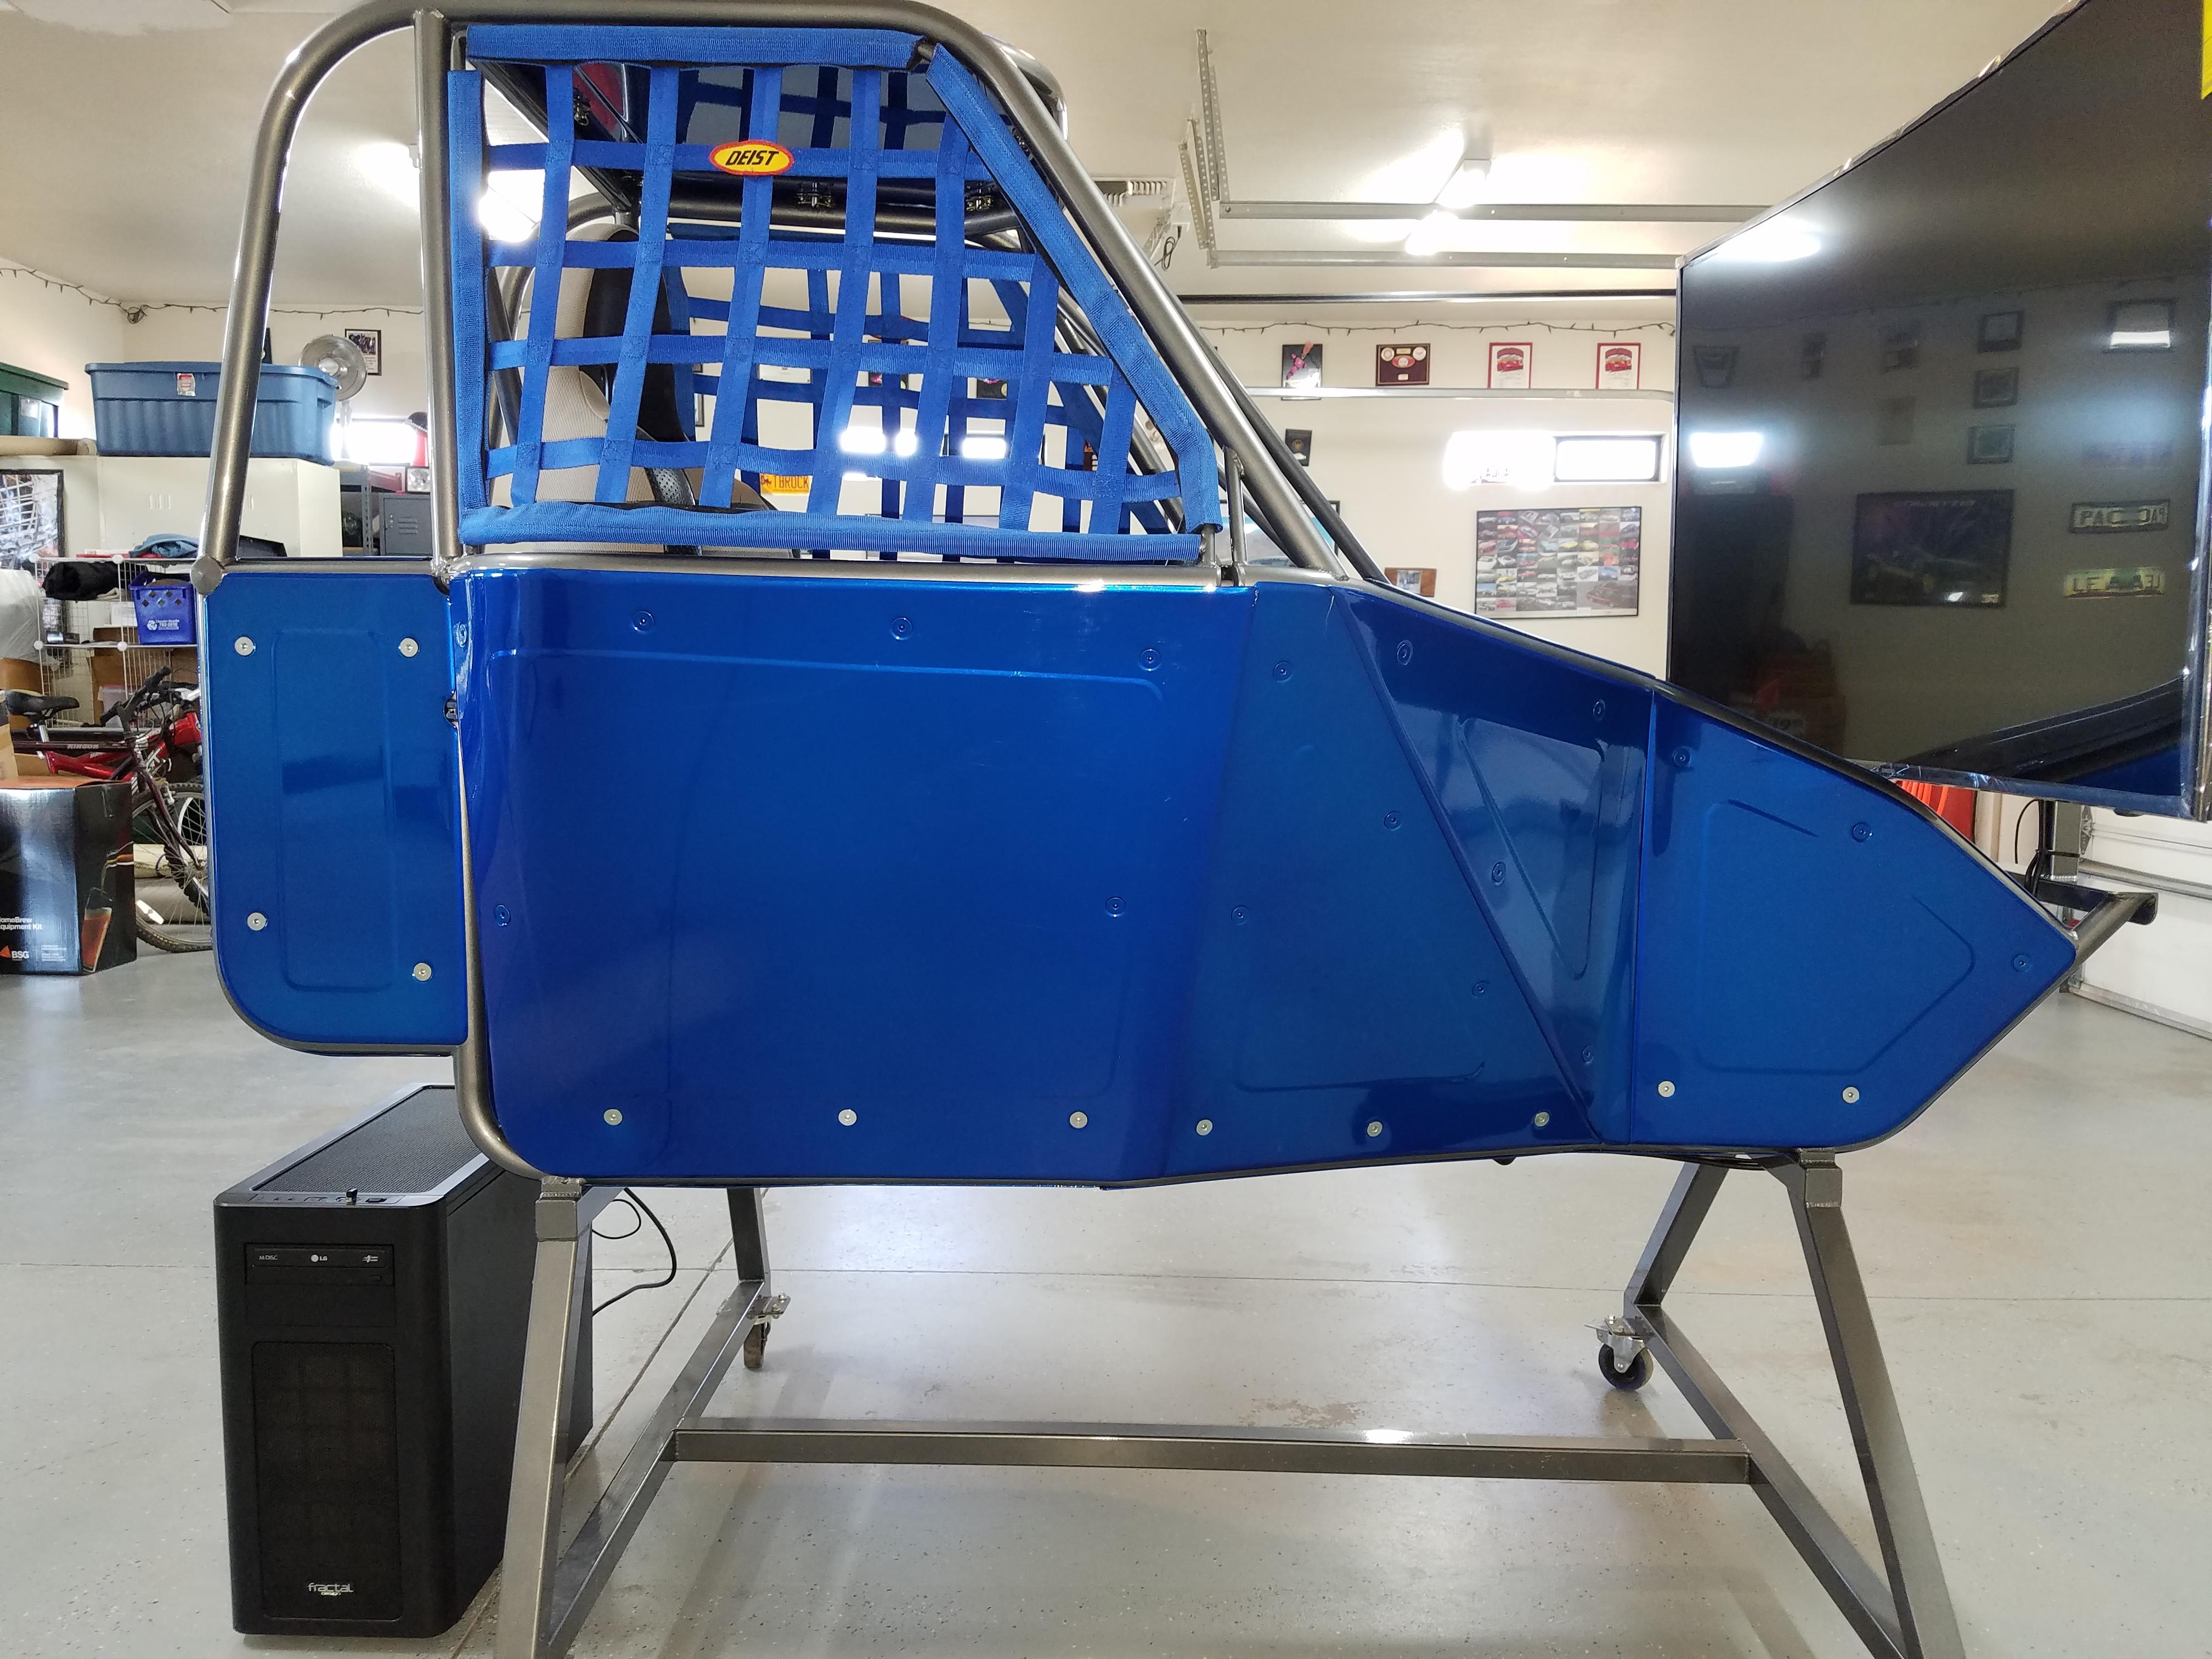 COMPLETE CUSTOM RACING SIMULATOR - $6,900 - Sim Gear - Buy ...